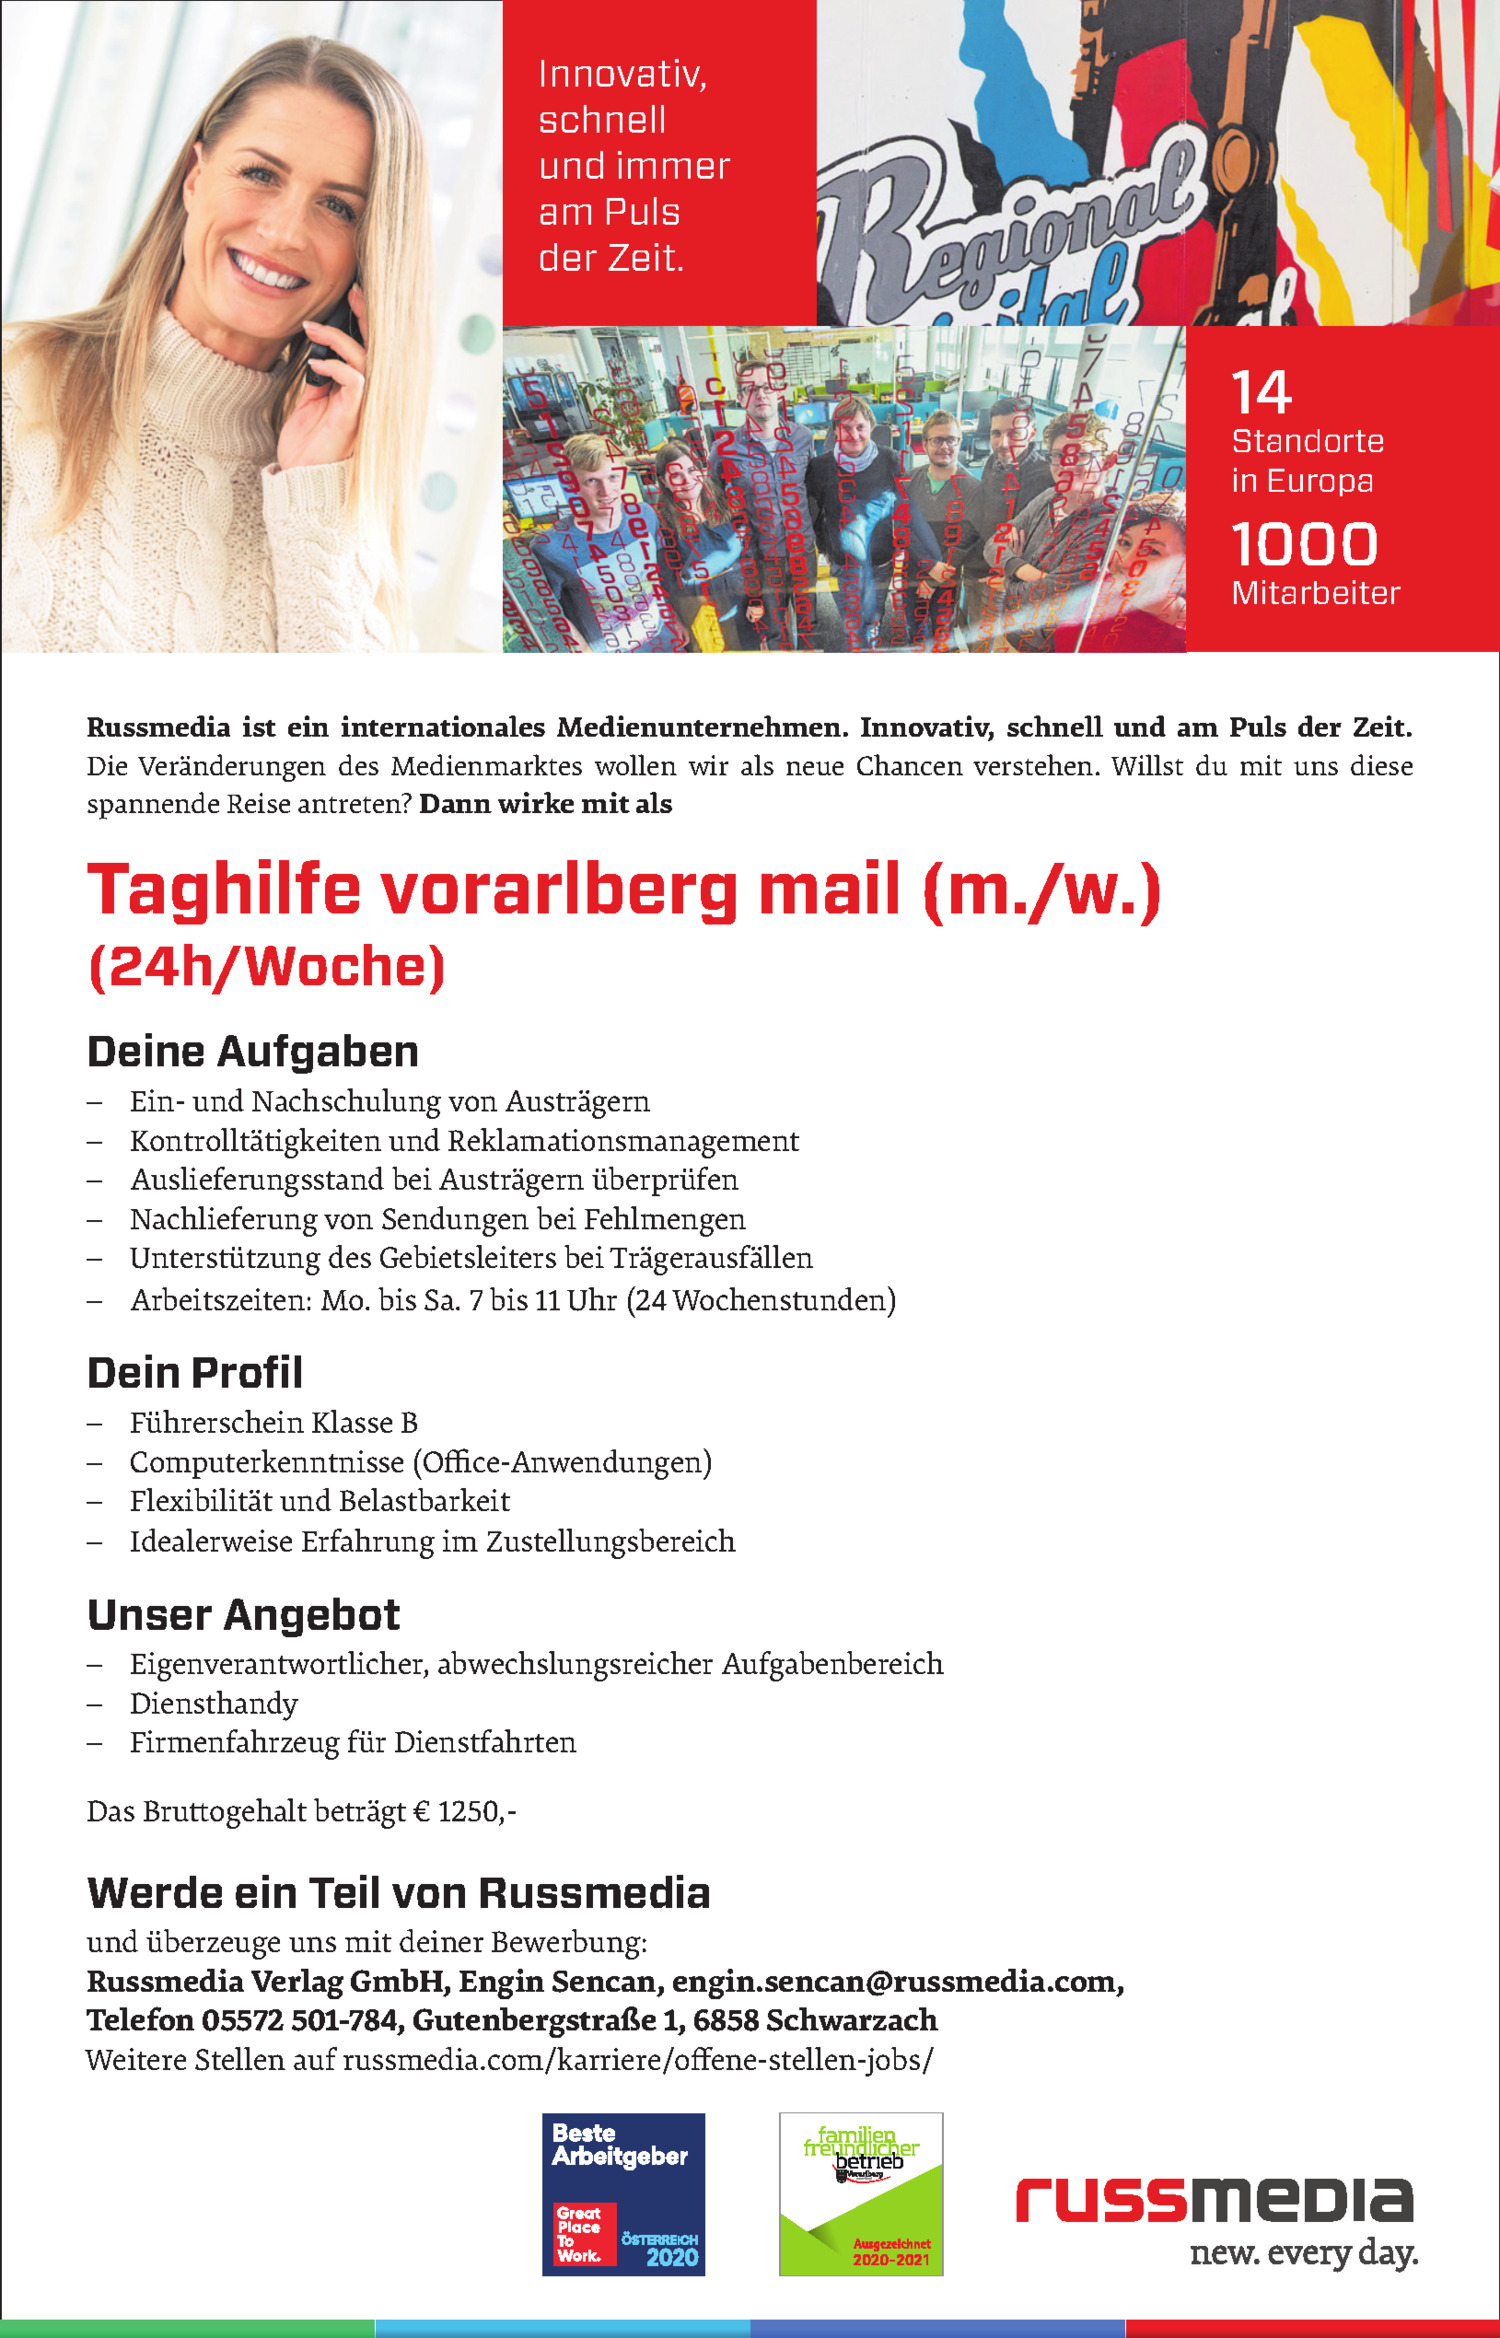 Inserat Taghilfe vorarlberg mail (m./w.) (24h/Woche)